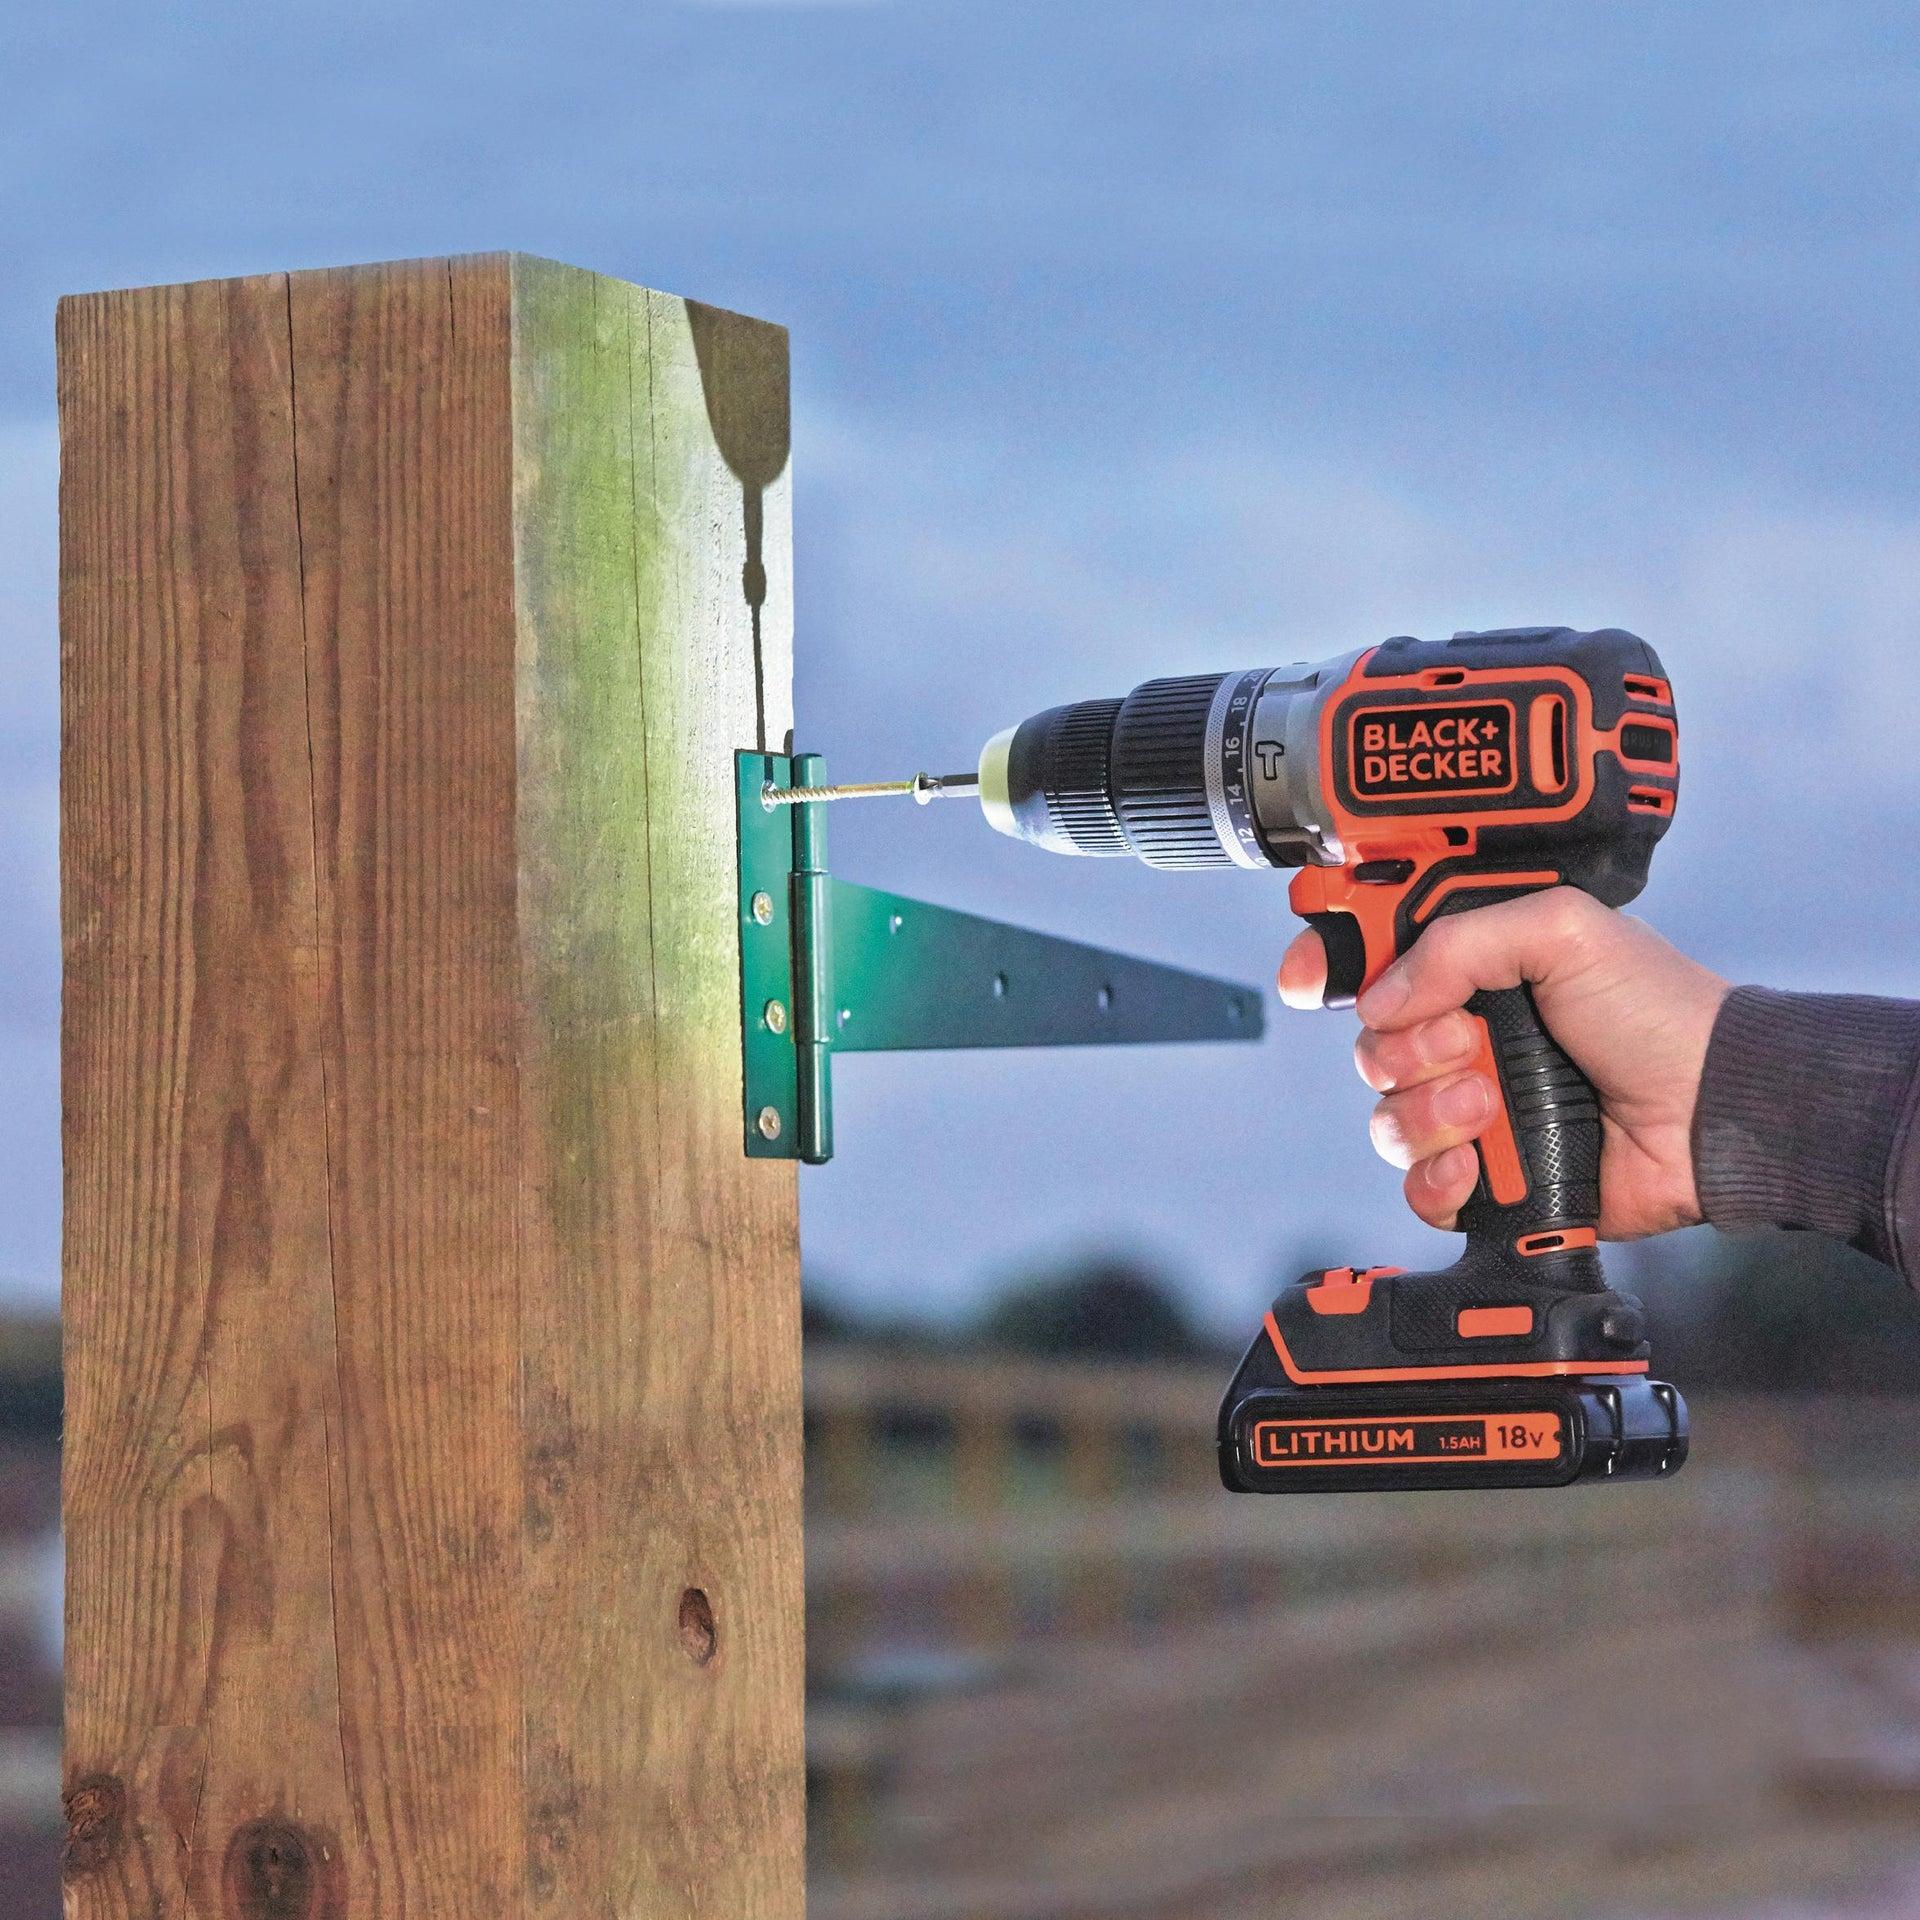 Trapano avvitatore a batteria BLACK + DECKER BL188KB-QW 18 V, 1.5 Ah, 2 batterie - 5